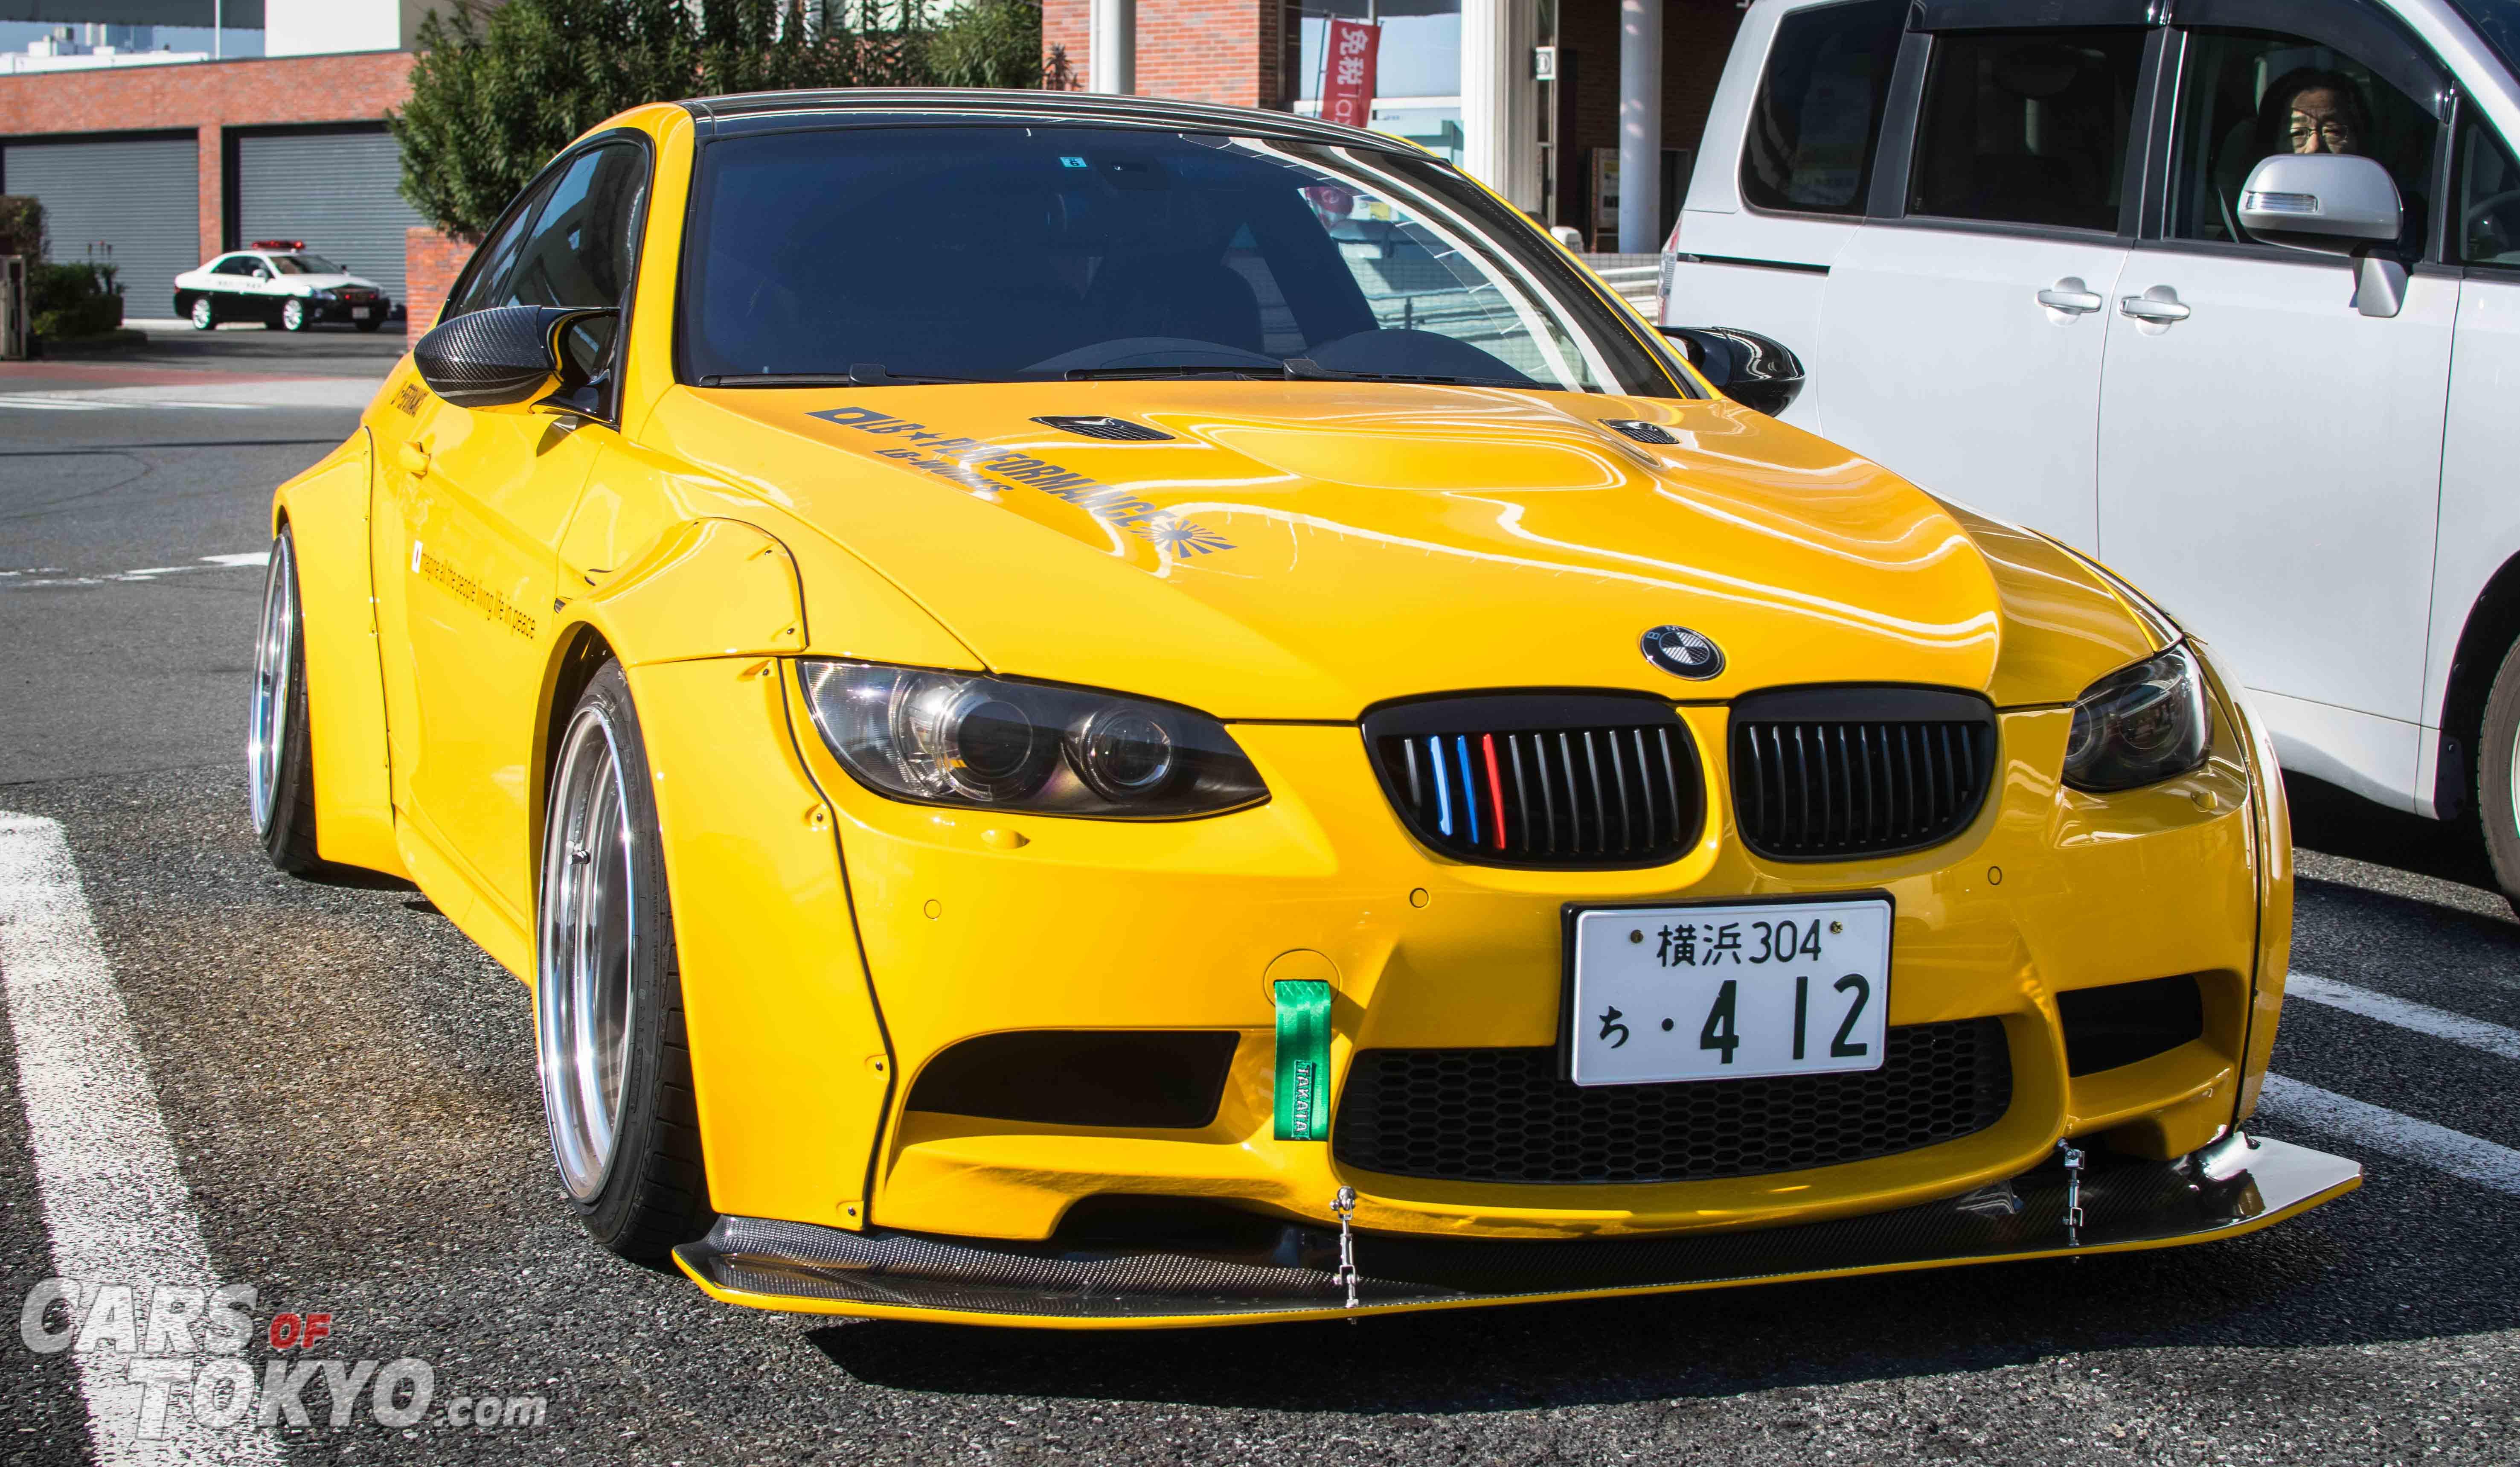 Cars of Tokyo Liberty Walk BMW M3